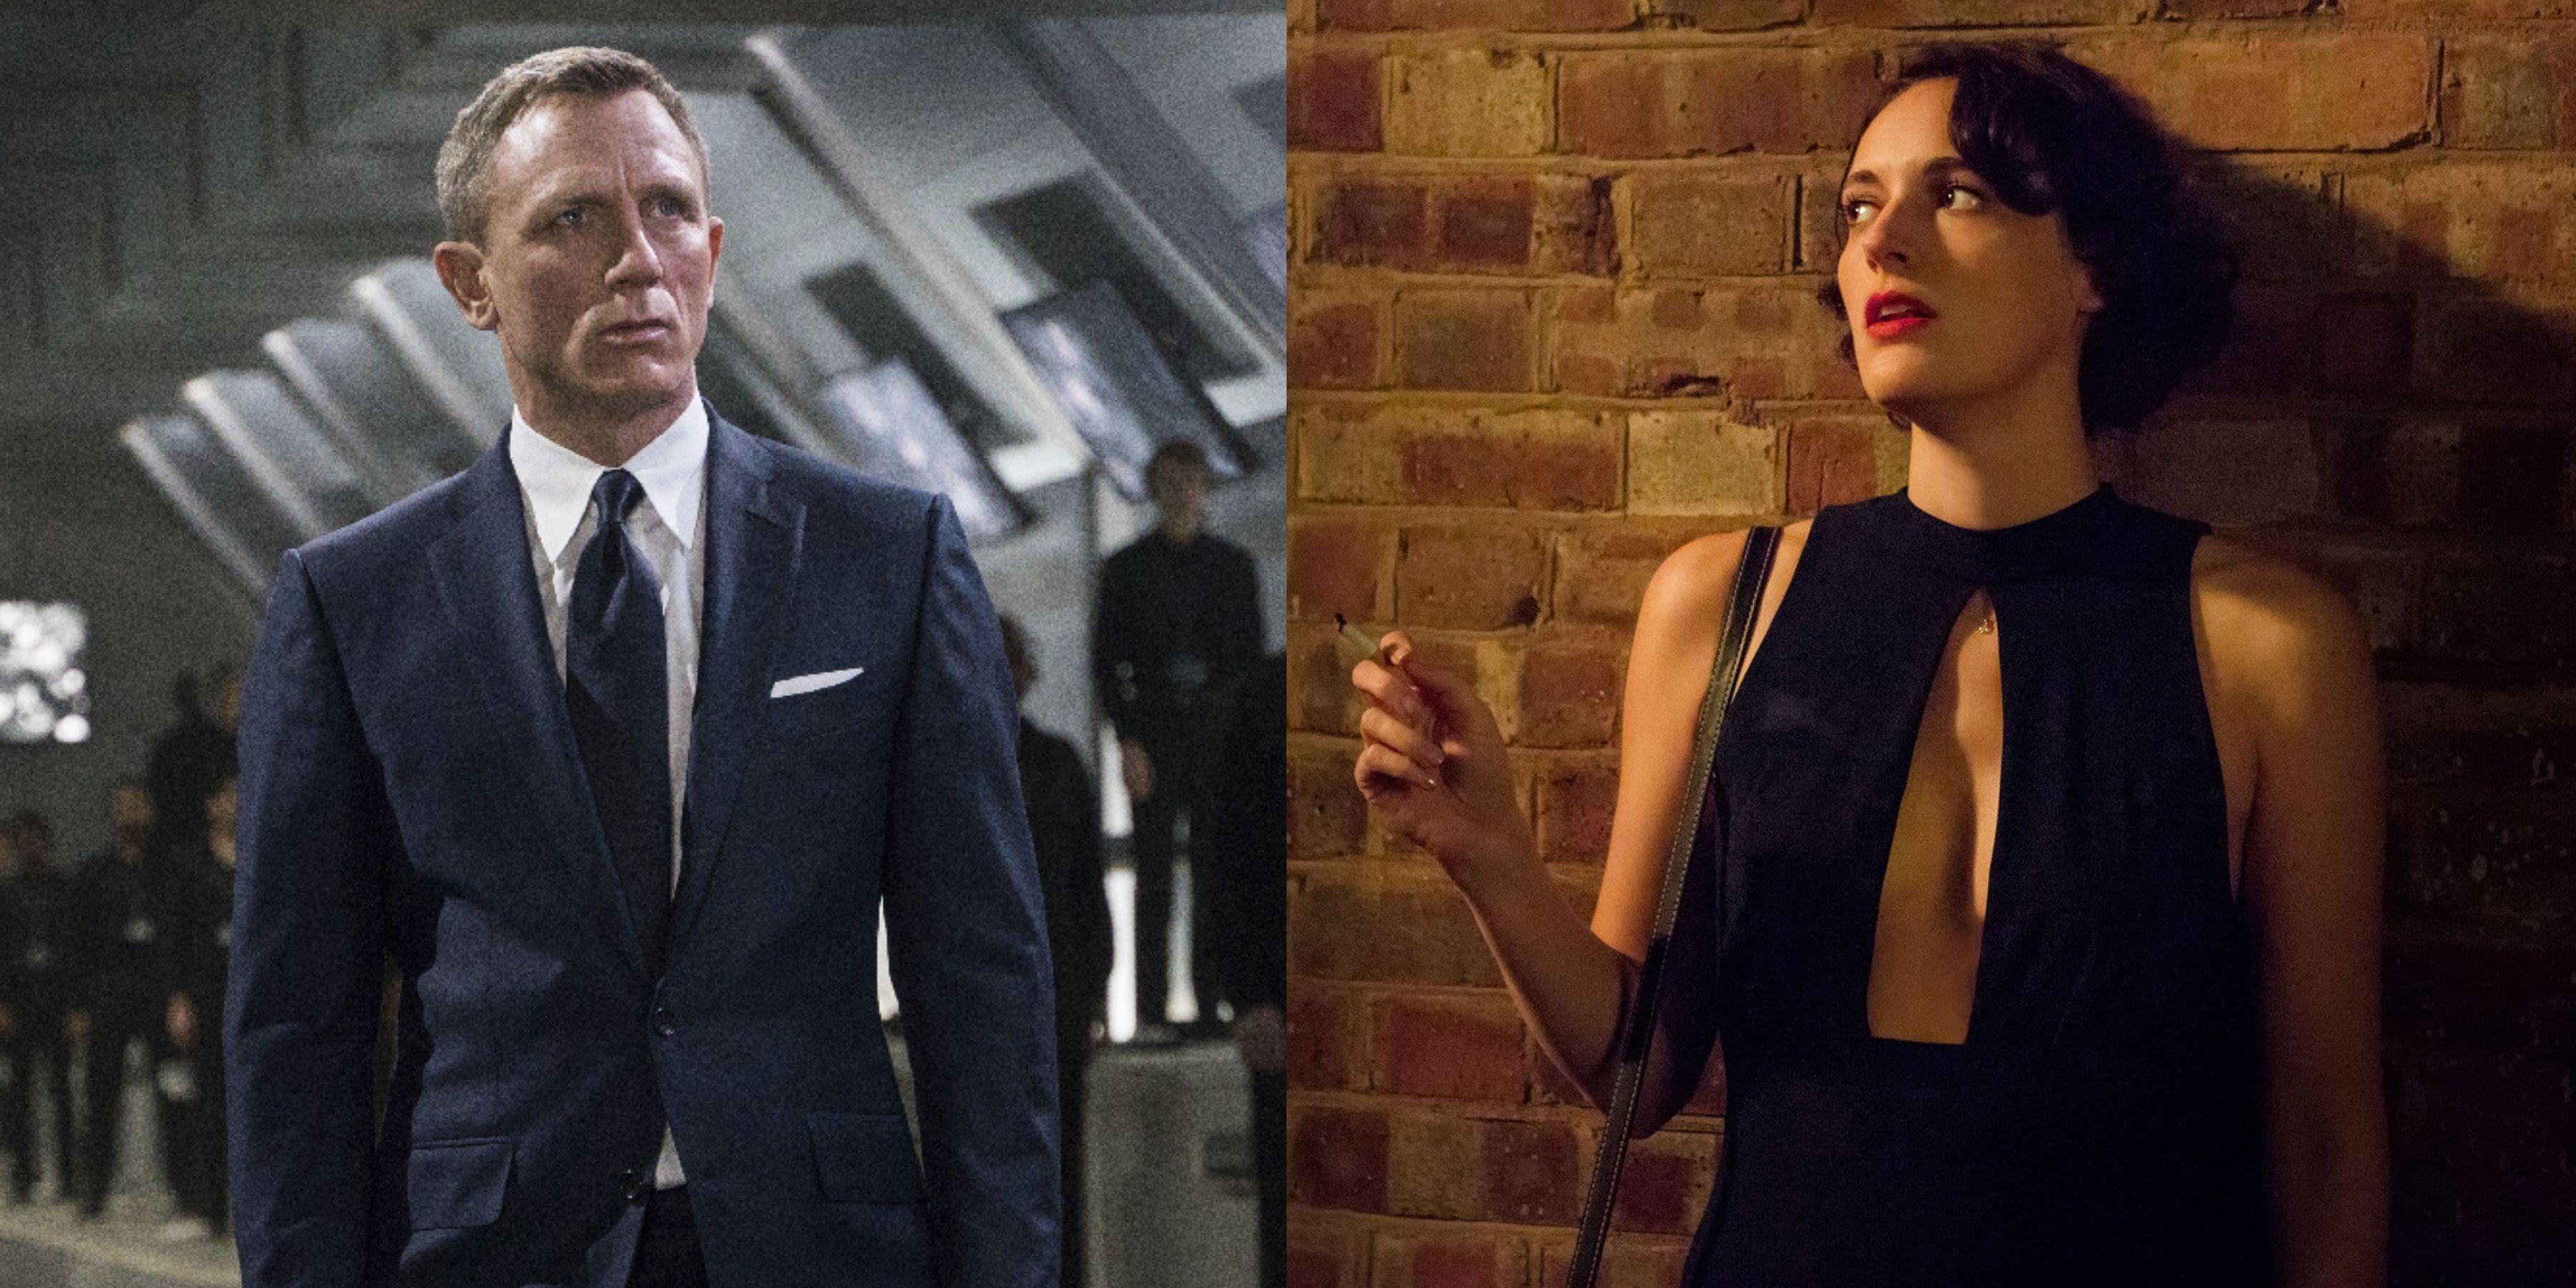 Bond 25 Writer Phoebe Waller-Bridge: The Franchise Should Treat Women Properly, Even If Bond Doesn't